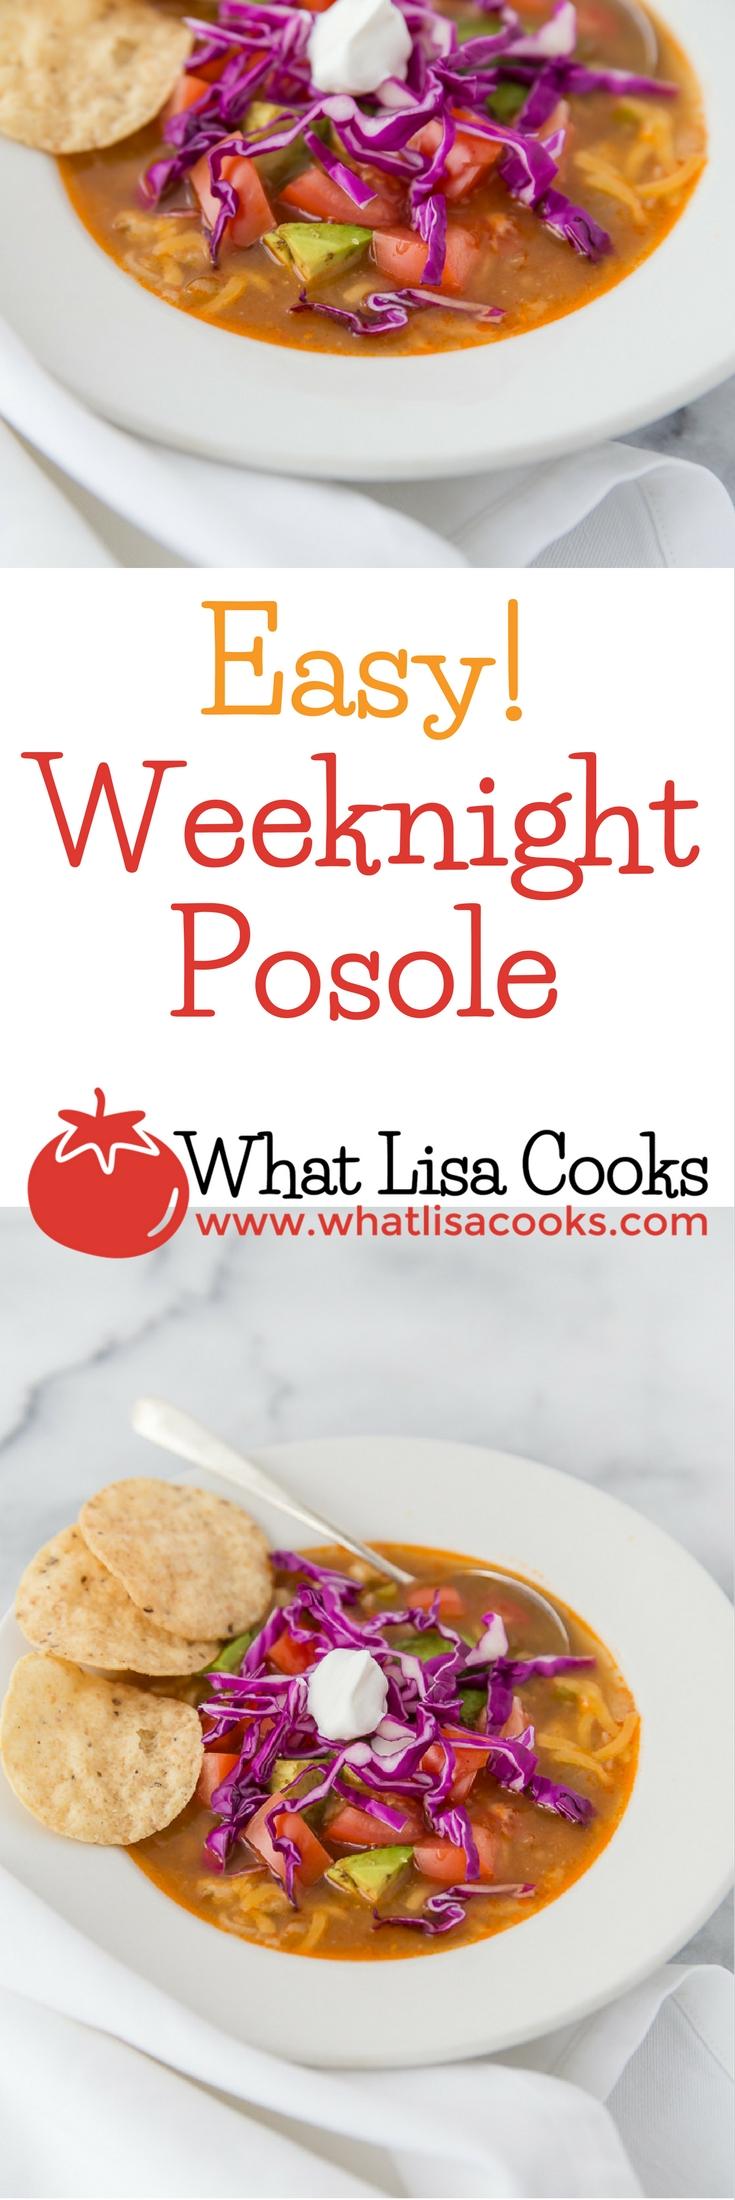 Easy Weeknight Posole Recipe | WhatLisaCooks.com